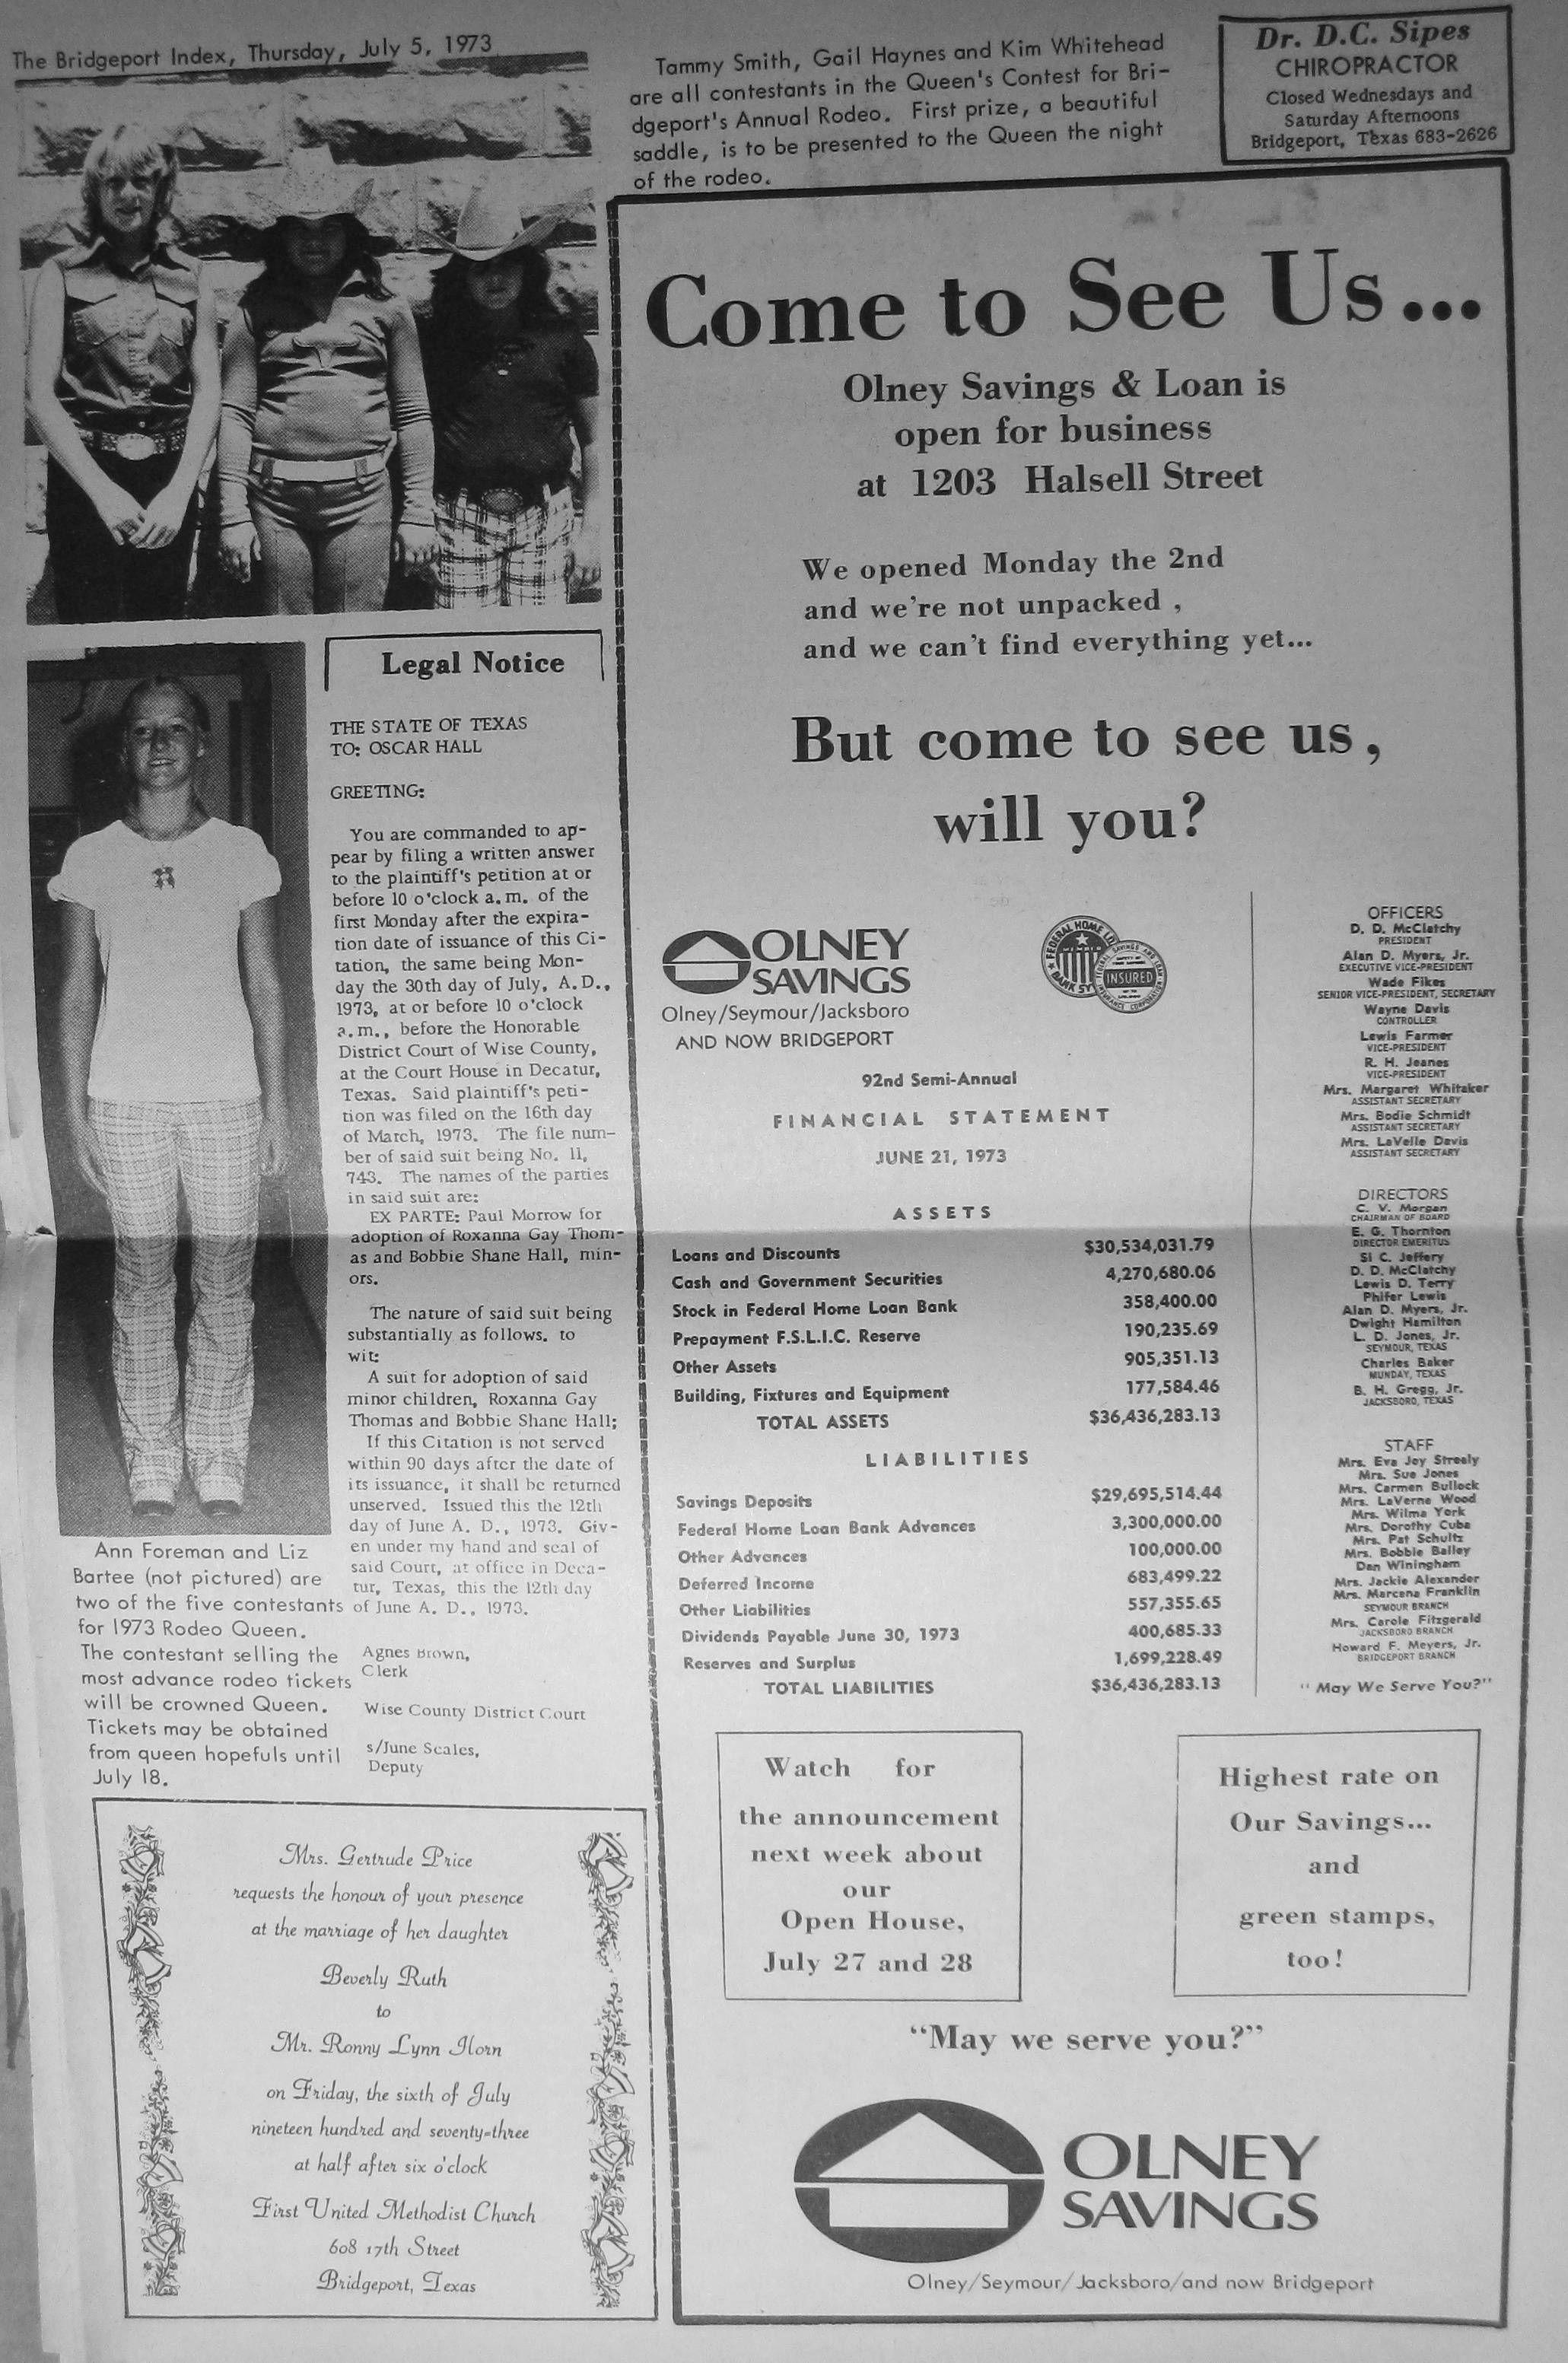 http://www.wisecountytexas.info/bridgeportindex/images/1973/1973-07-05-pg20.jpg